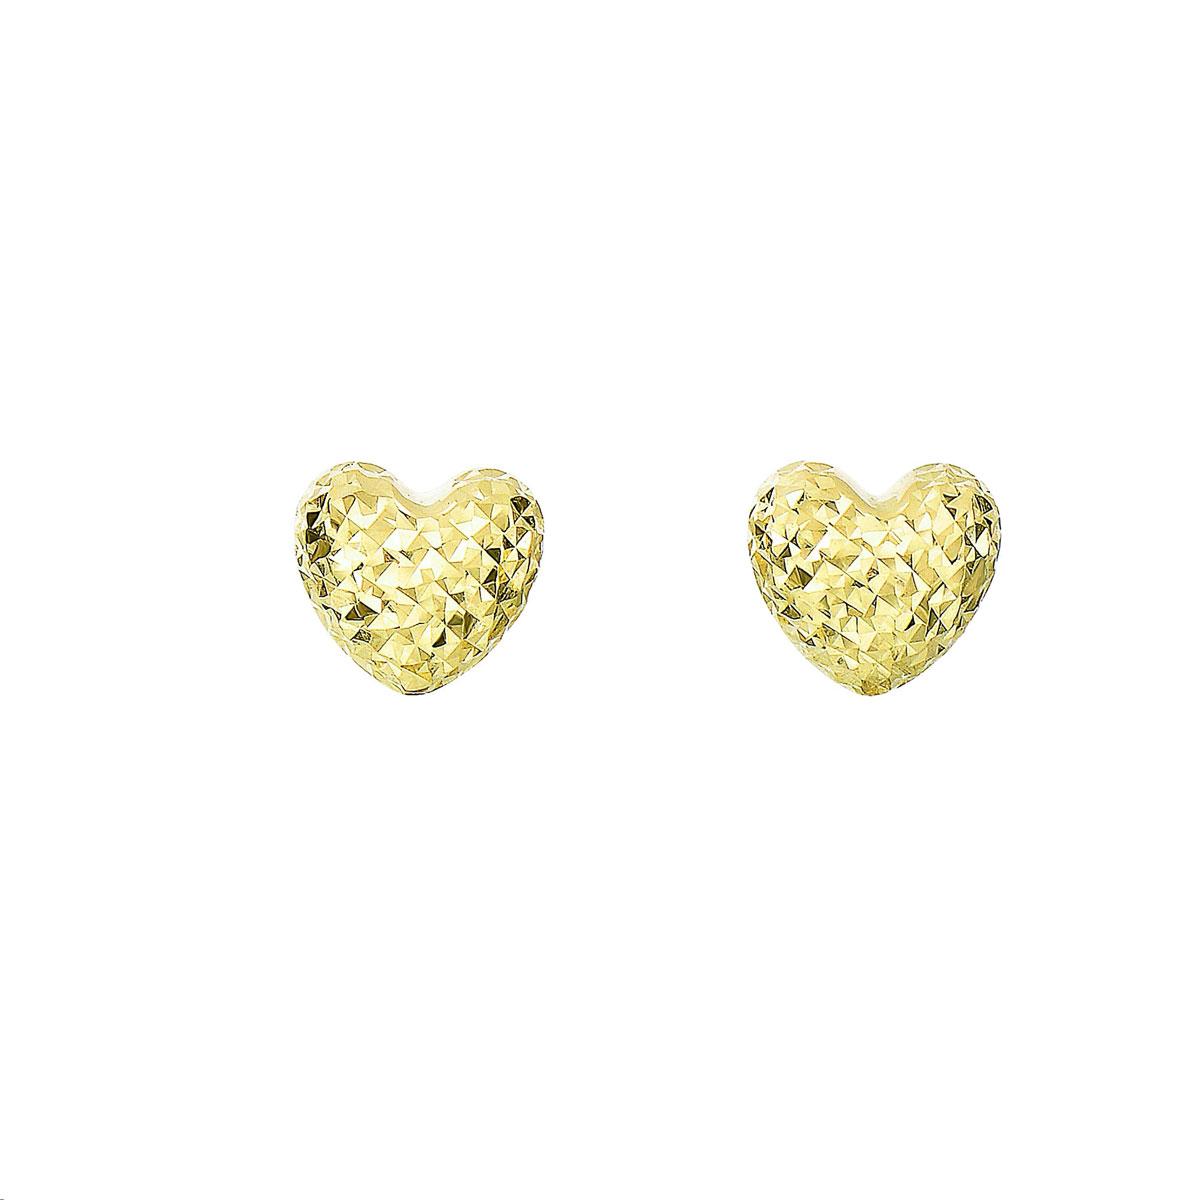 Royal Chain 14 Karat Yellow Gold Diamond Cut Heart Shaped Stud Earrings